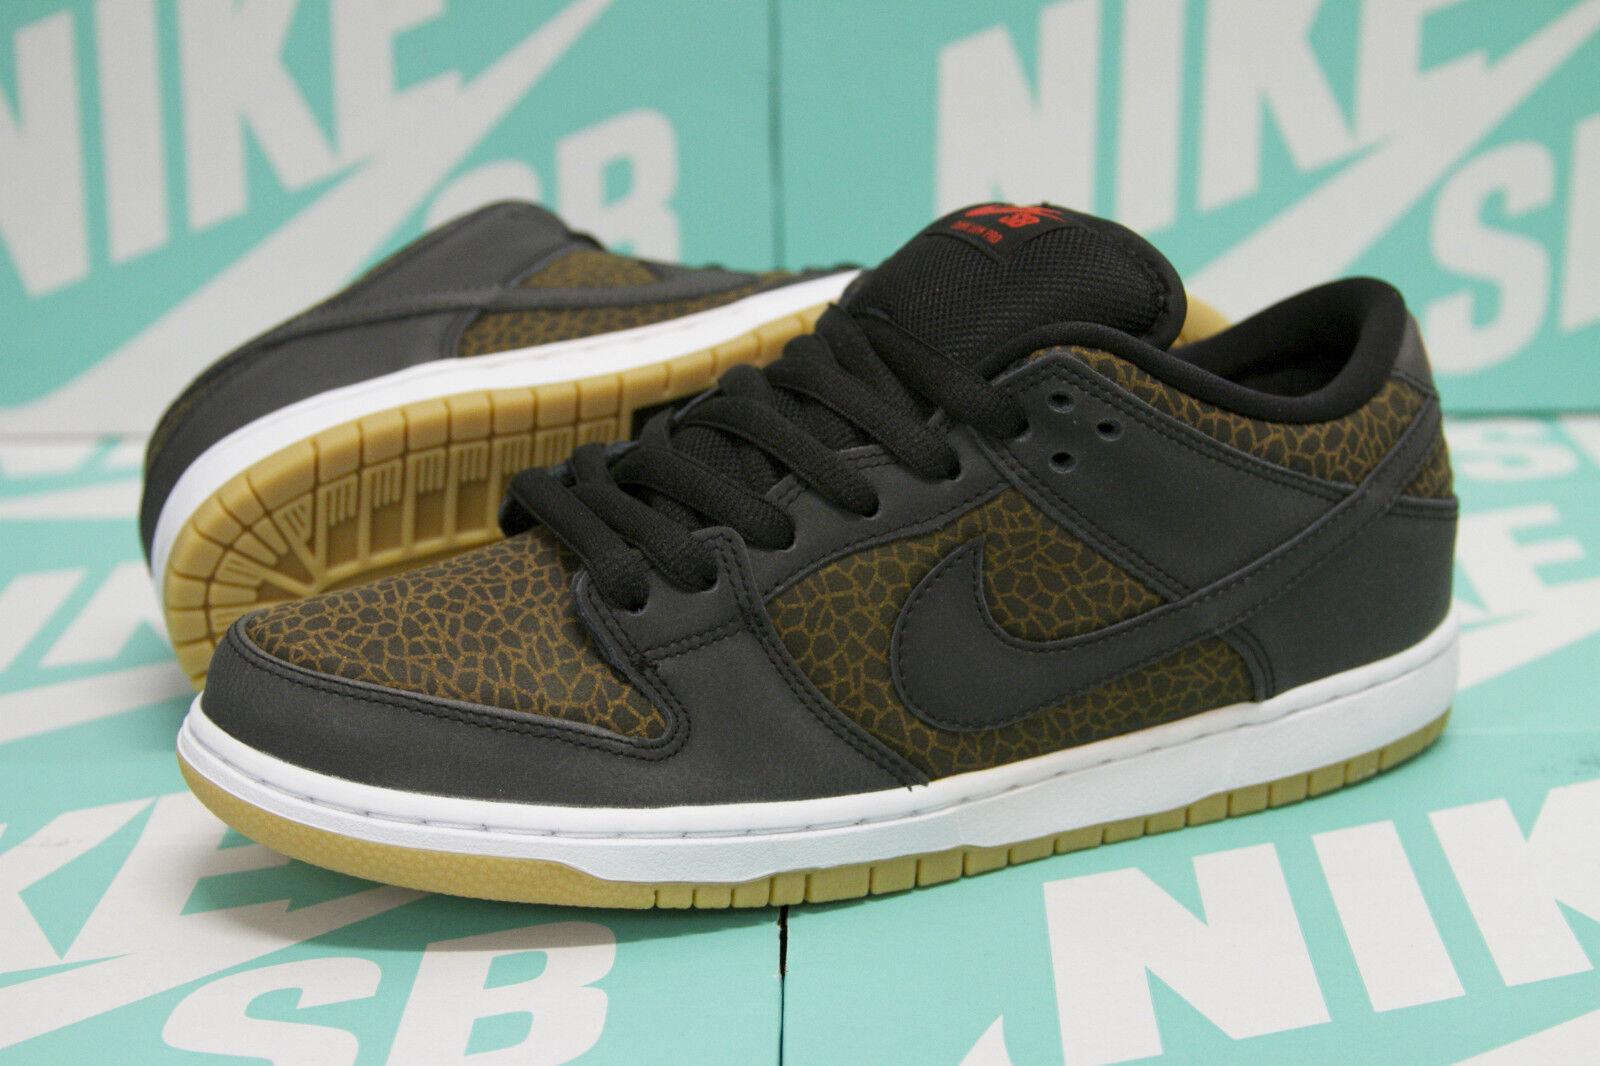 Nike SB Dunk Low Premium Safari - Black / Team Orange 313170 018 New Size 8.5